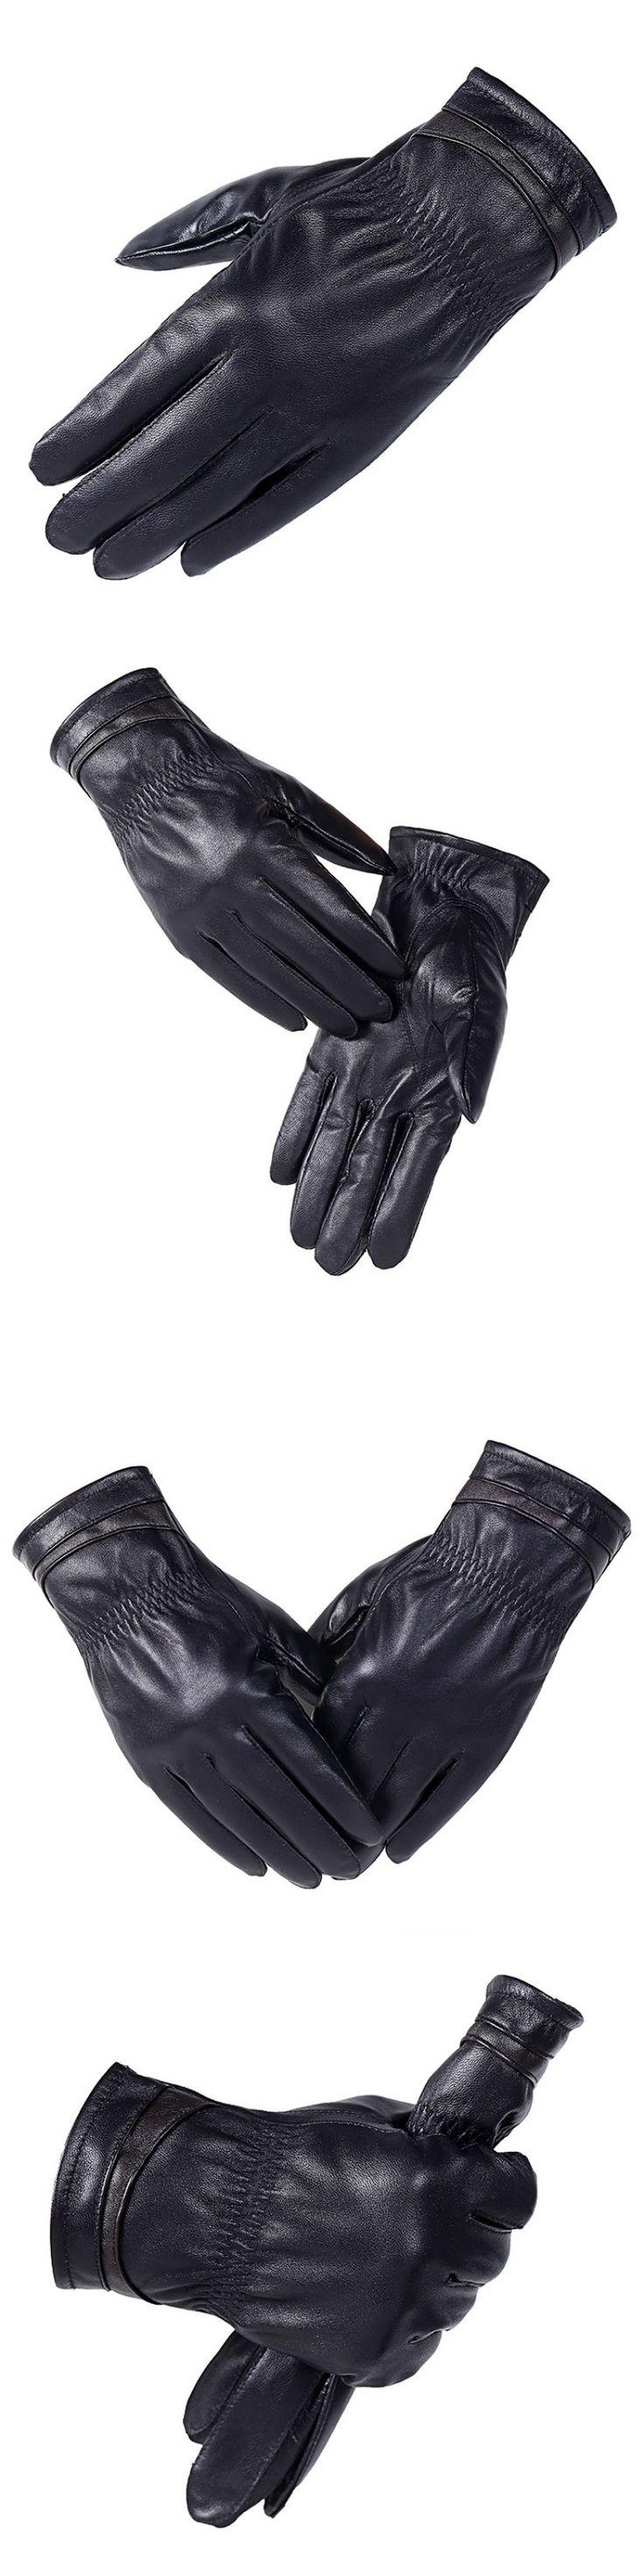 KUYOMENS New Designer Luxury Mens Gloves High Quality Genuine Leather sheepskin Mittens Warm Winter Gloves for Male Glove luvas